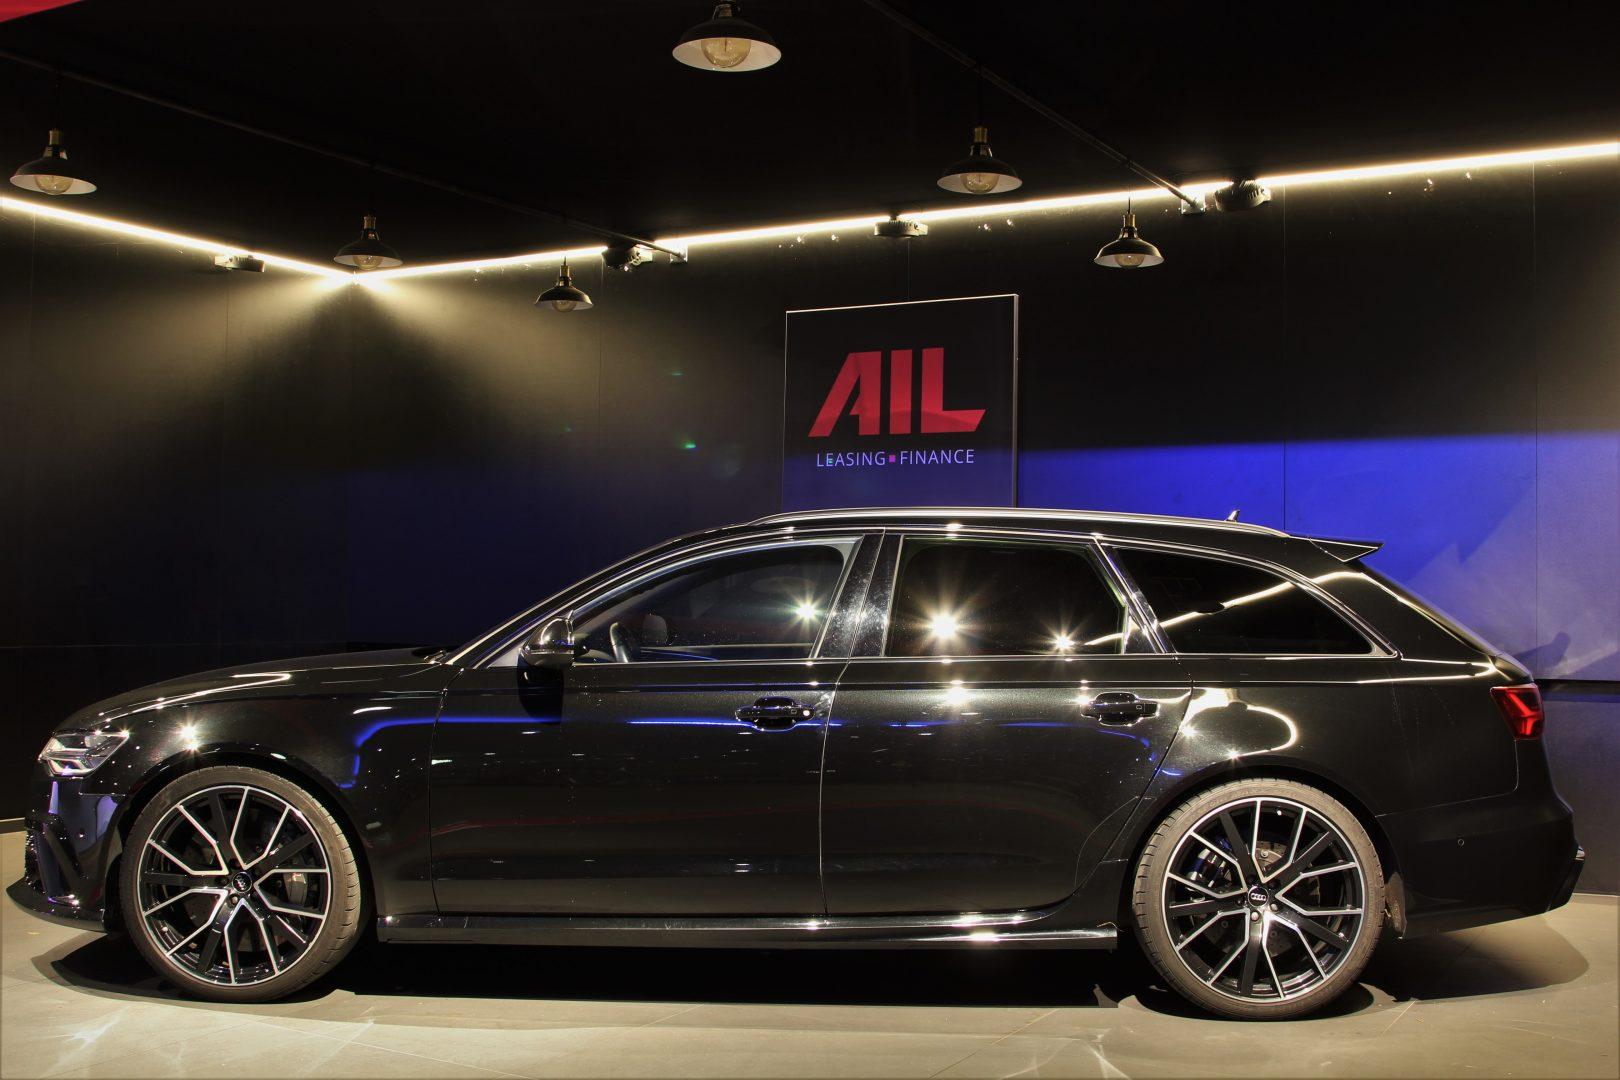 AIL Audi RS6 Avant Performance 4.0 TFSI Carbon Paket  8